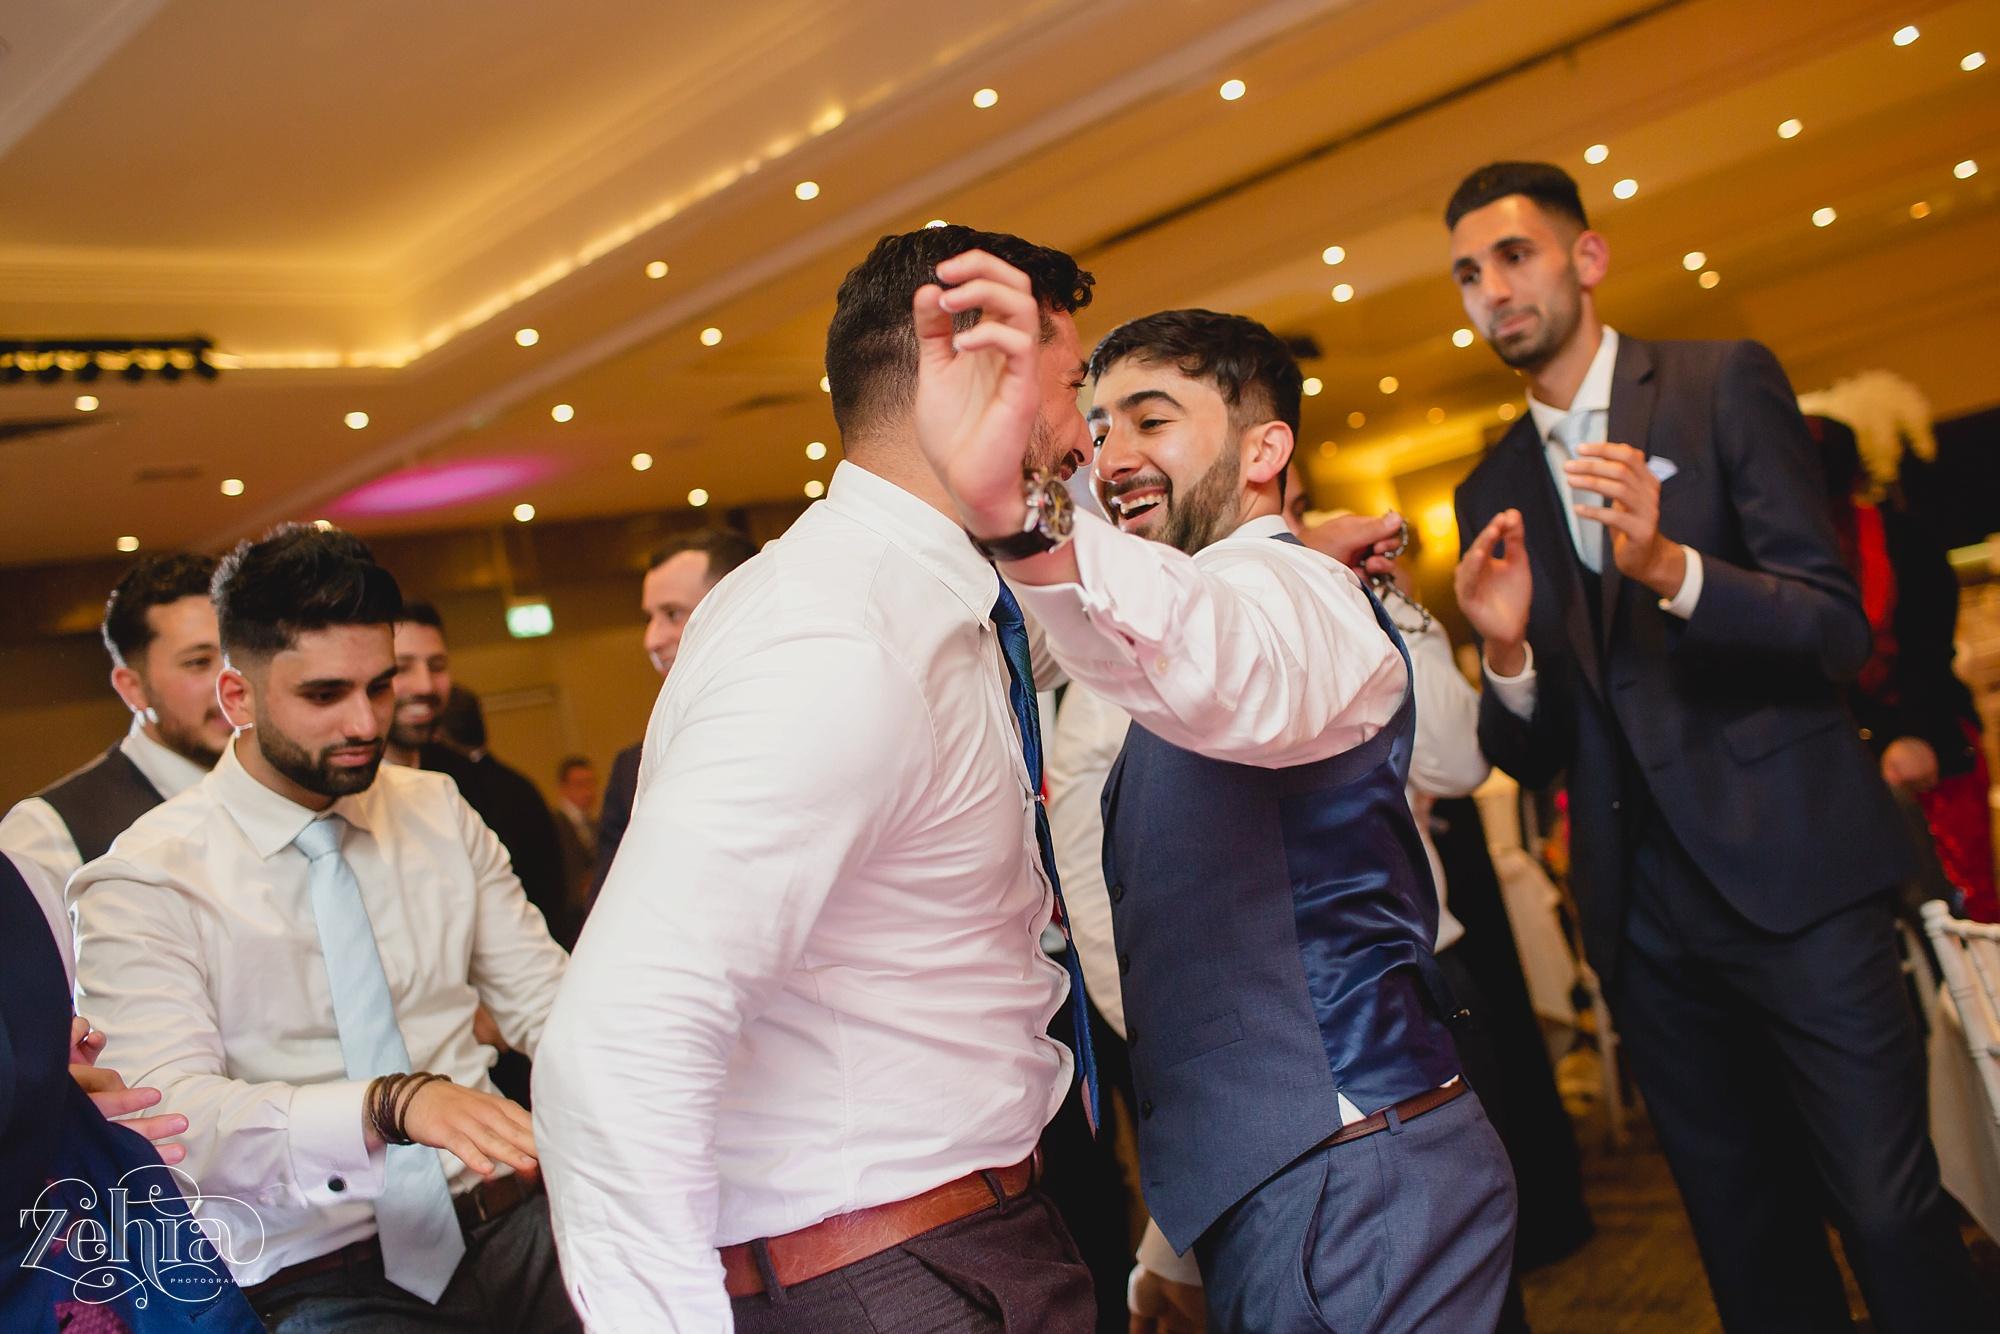 zehra photographer mere cheshire wedding_0064.jpg